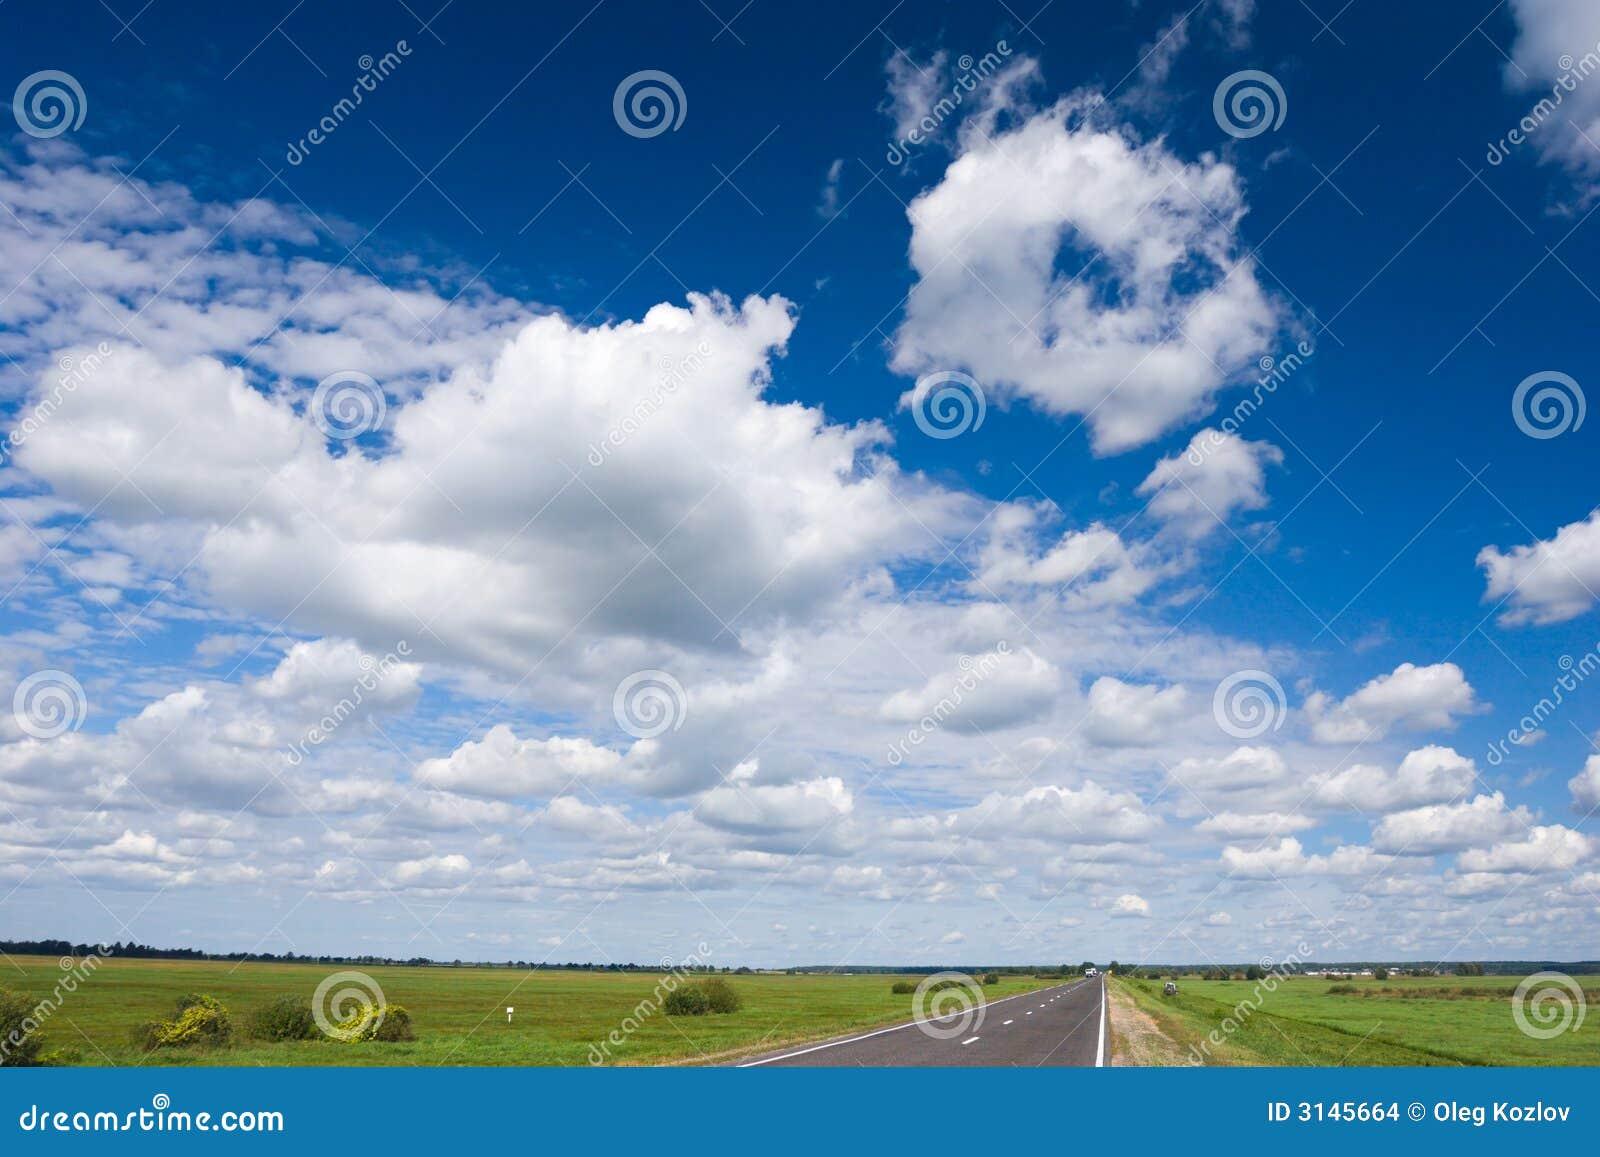 Strada e cielo